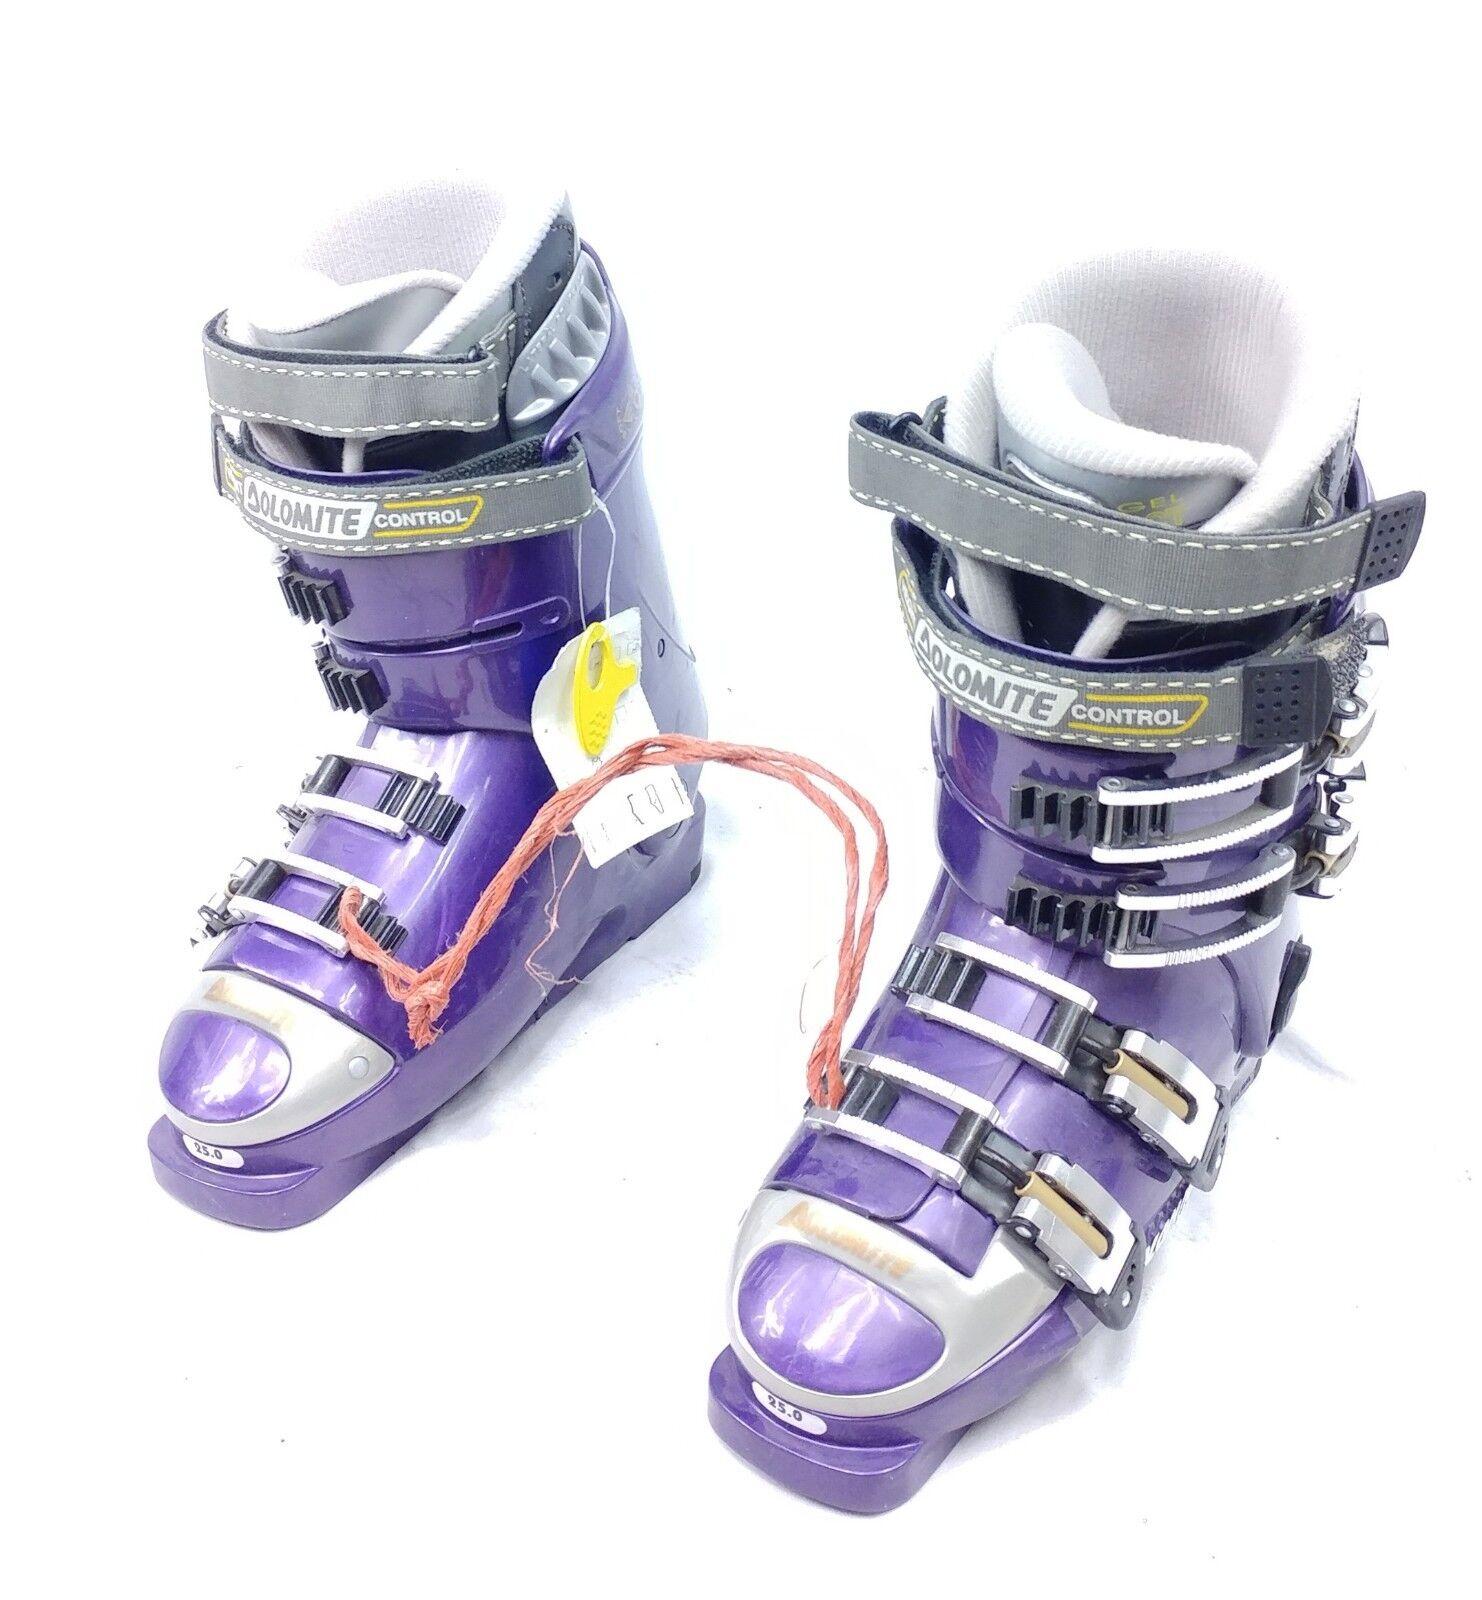 Ladies ski boots, New Dolomite CYB-X 5 size 25.5 purple Ski Boots, hi end